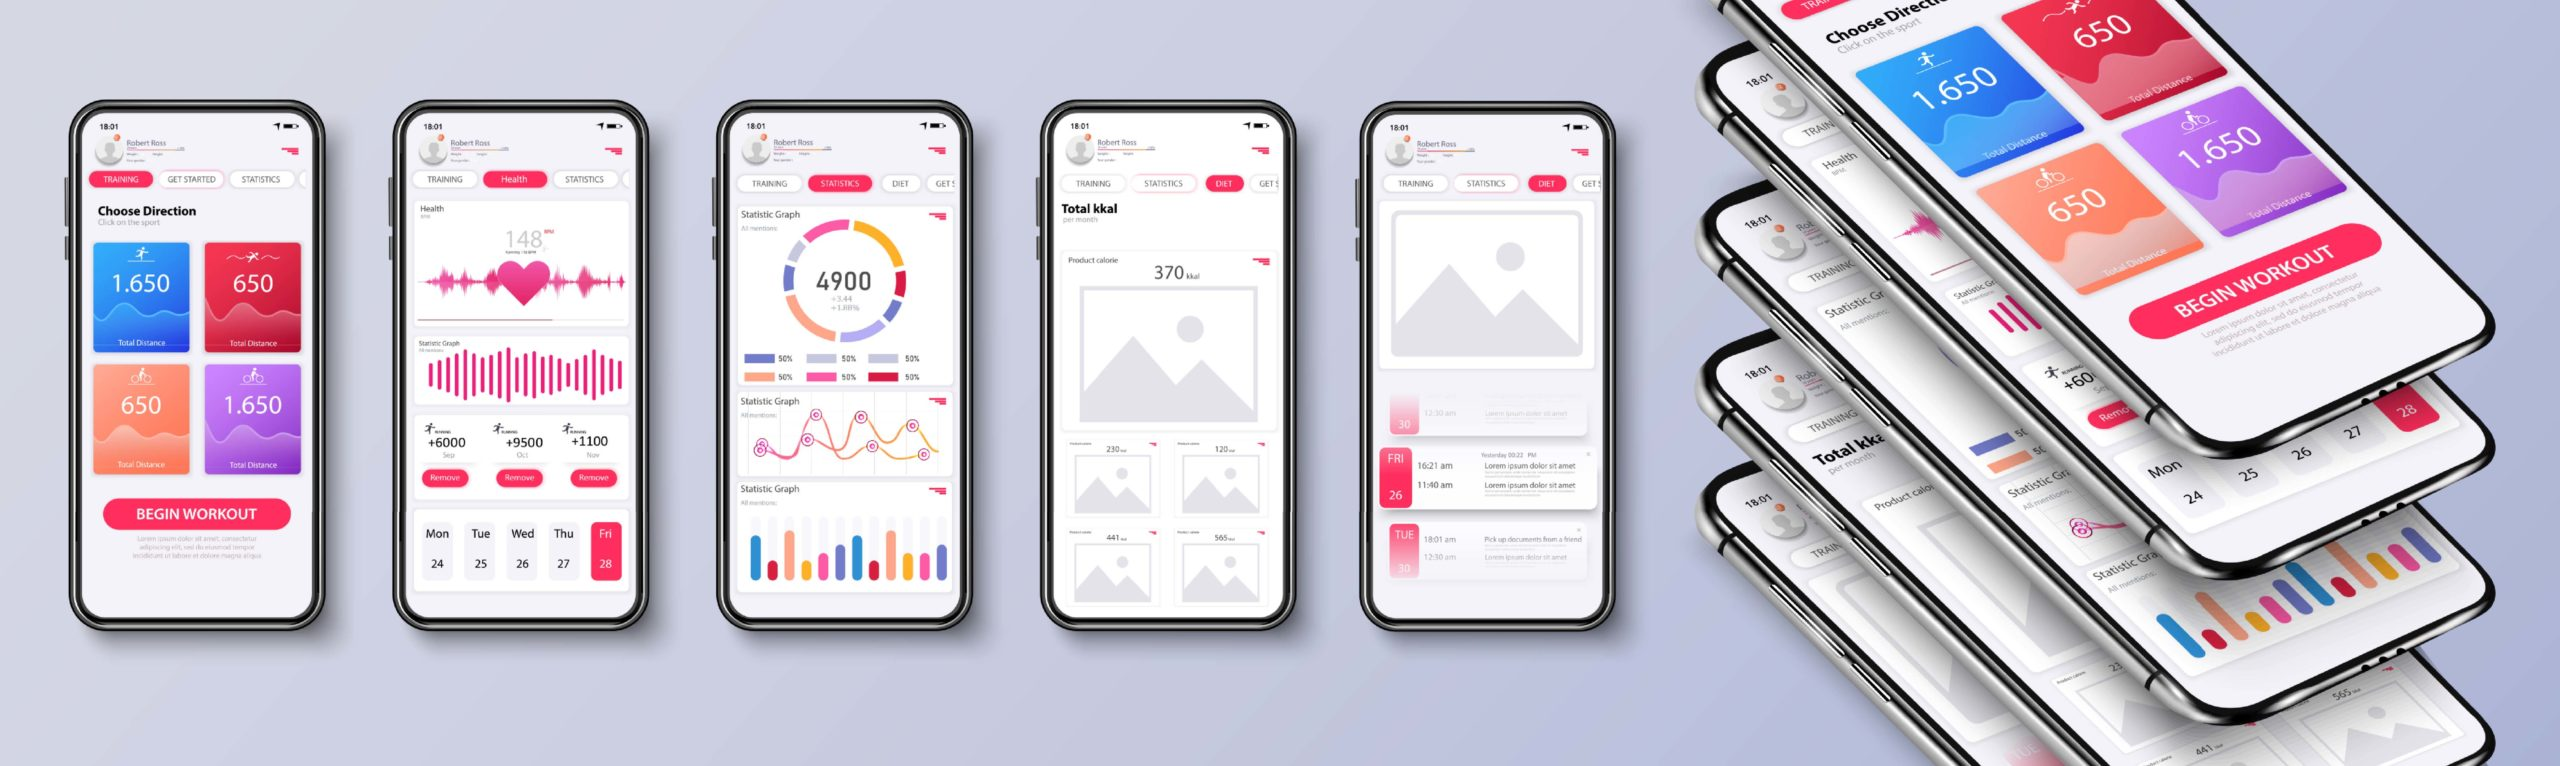 Web design application mobile